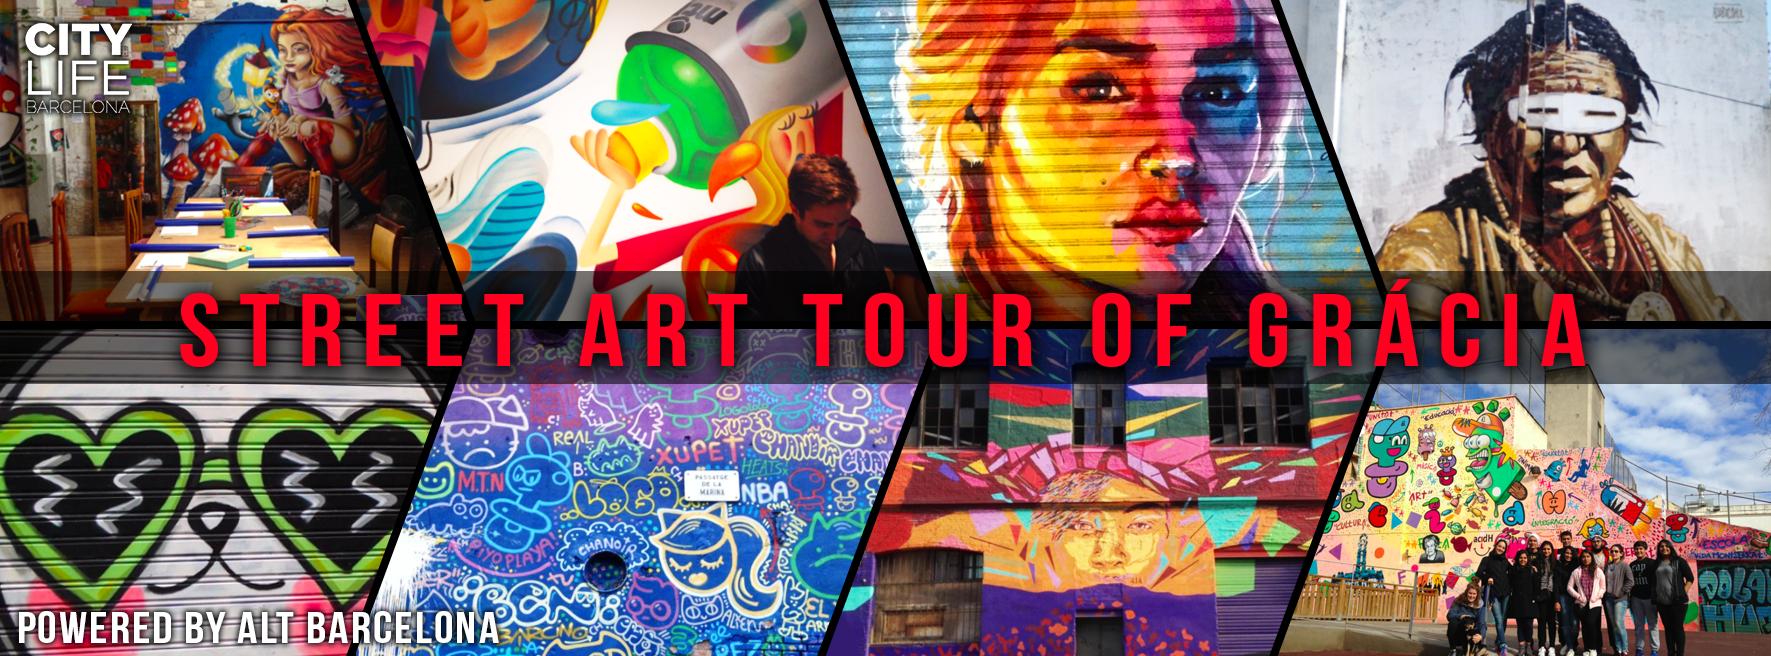 MEET & EXPLORE - Street Art Tour of Gràcia!